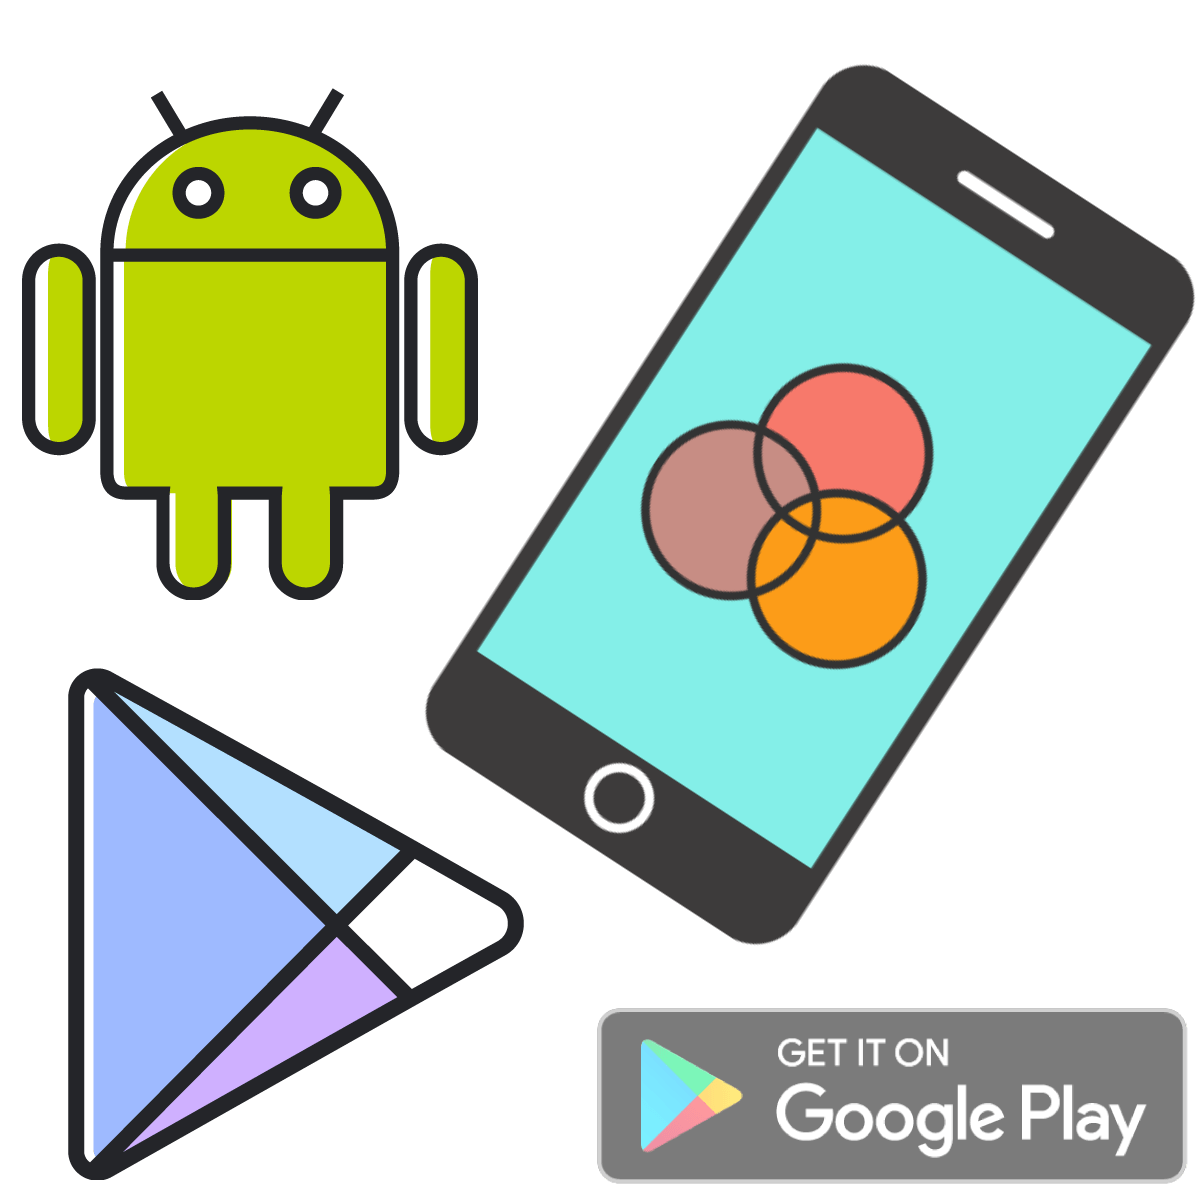 Android Native mobilna aplikacija - Pappiga mobilne aplikacije